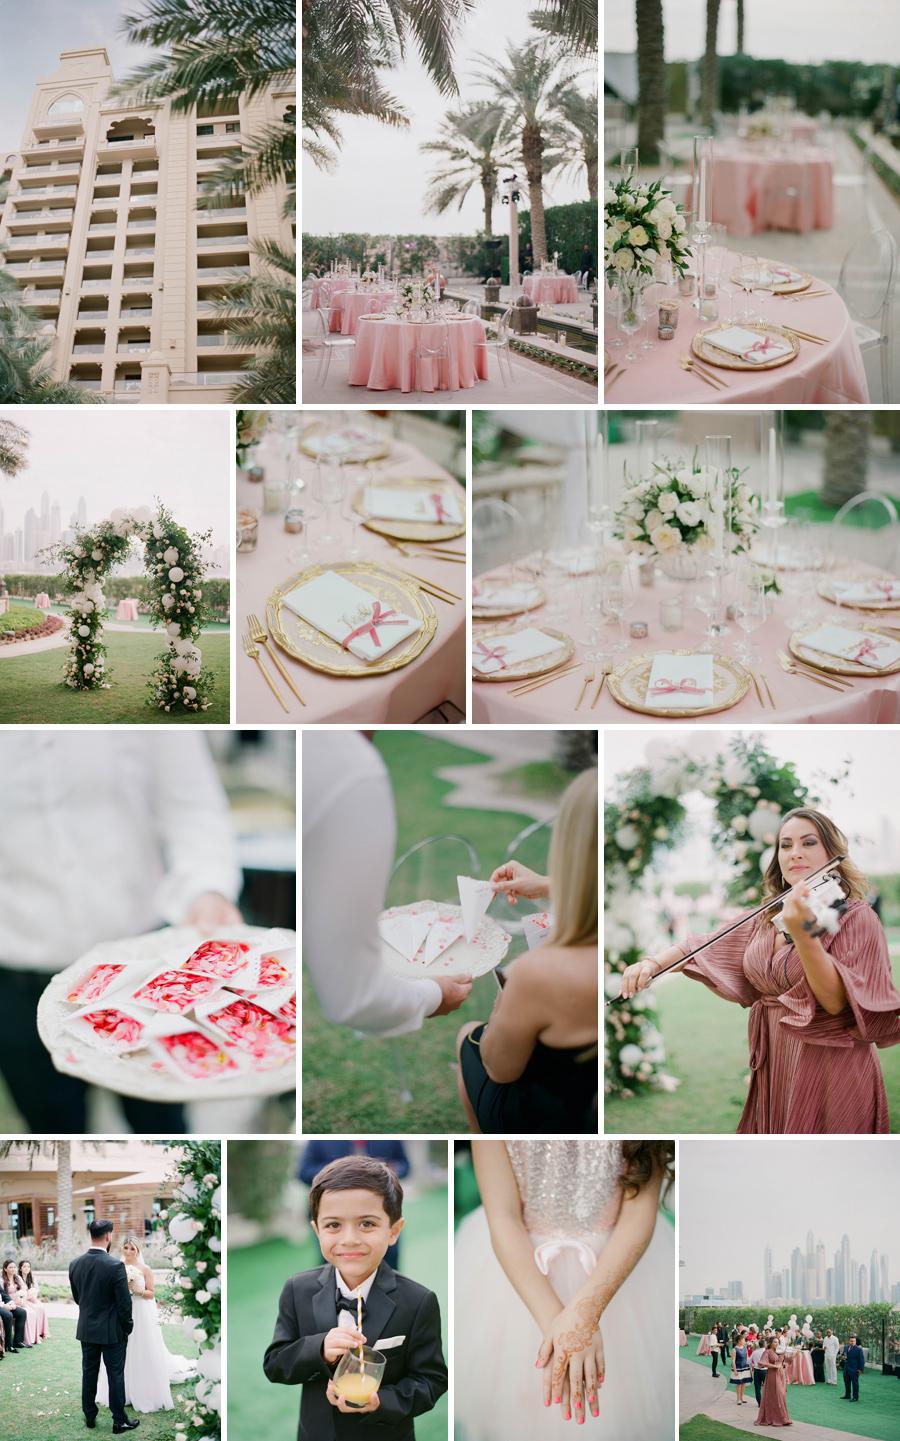 wedding photographer dubai fairmont bash events